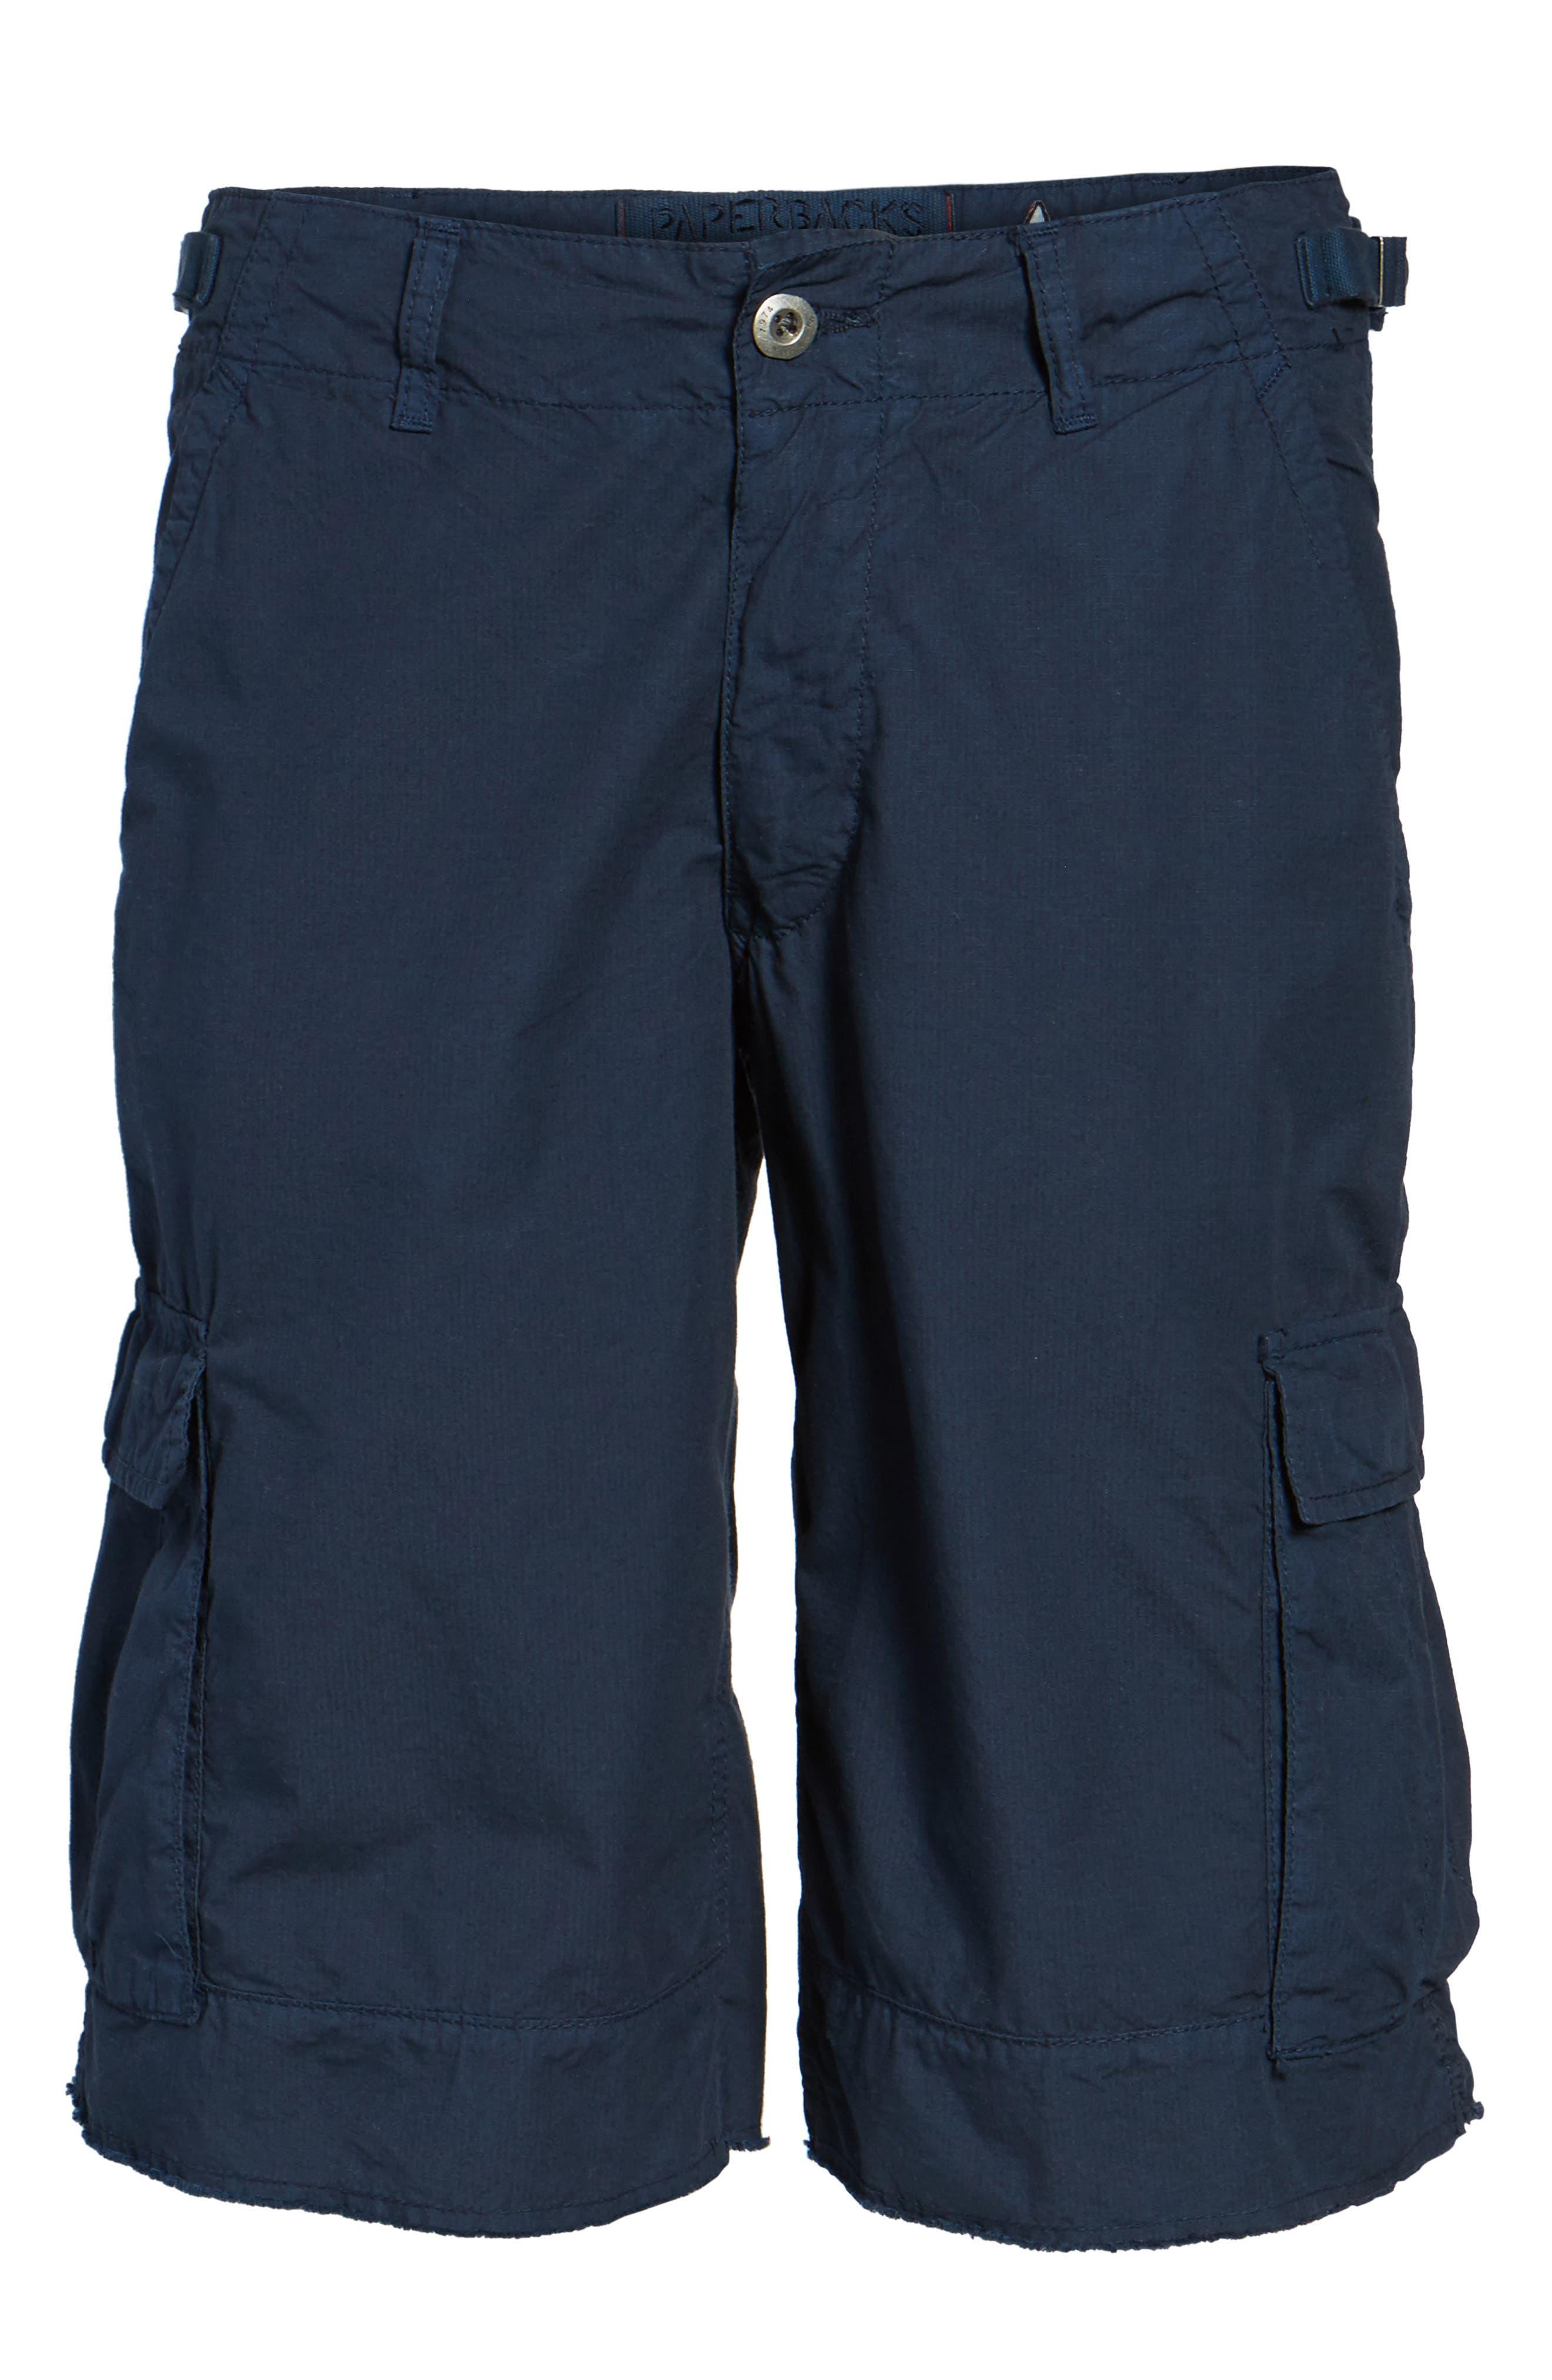 'Oxnard' Cargo Shorts,                             Alternate thumbnail 6, color,                             Navy